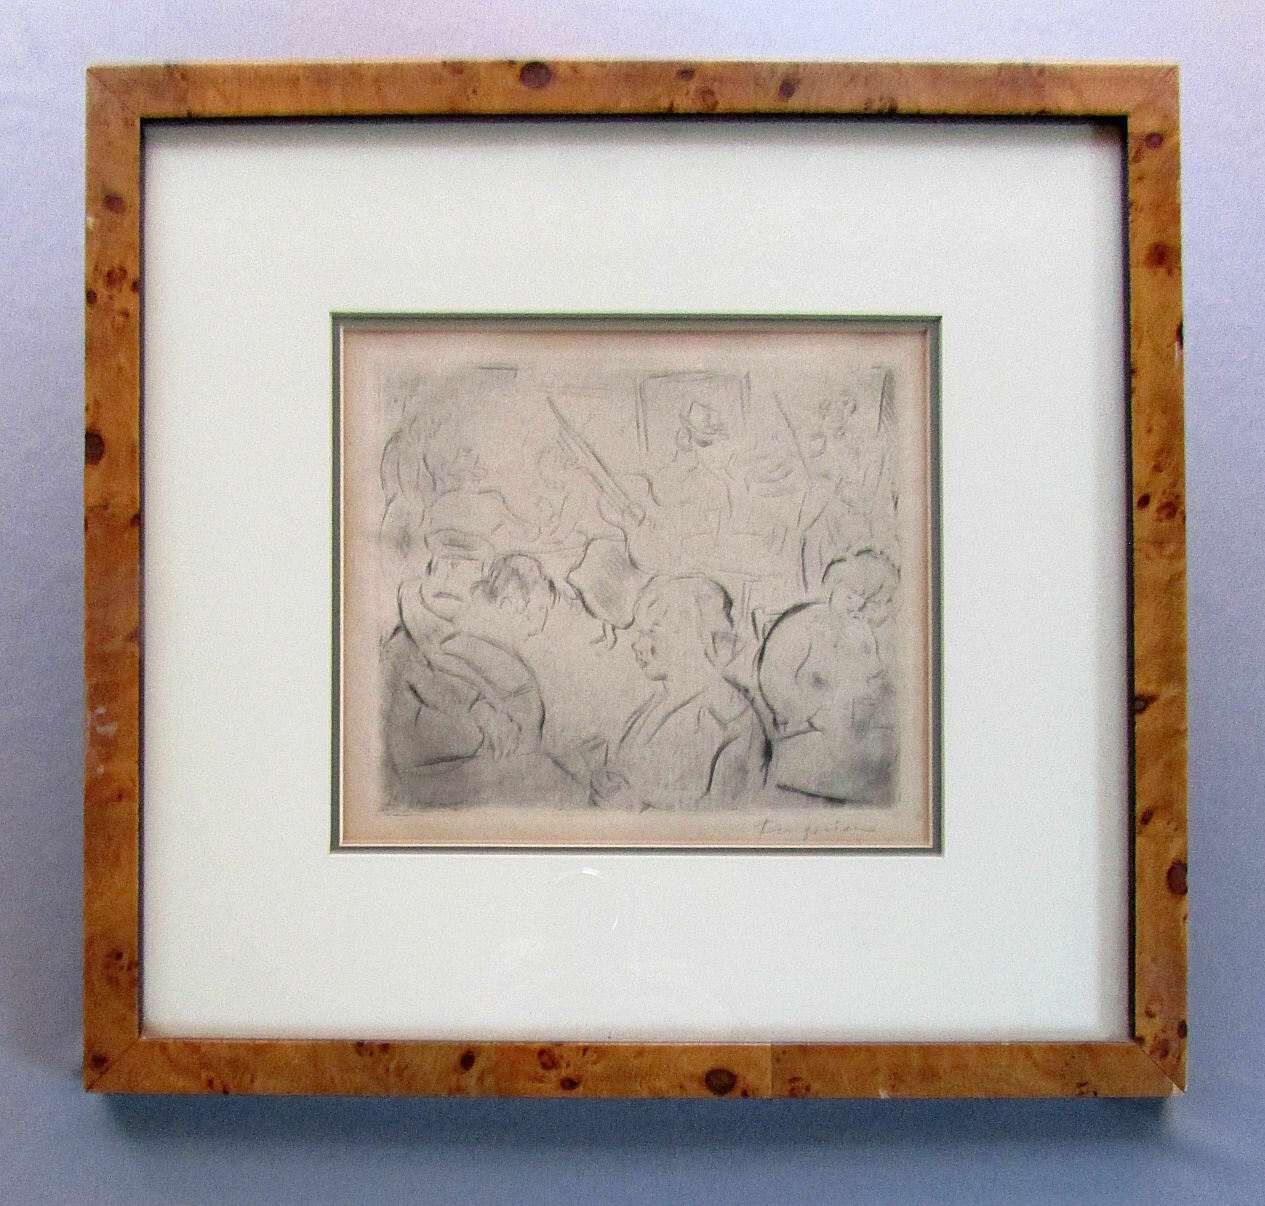 Vintage MICHEL FINGESTEN Original Etching MUSICIANS CABARET Pencil Signed on eBay thumbnail